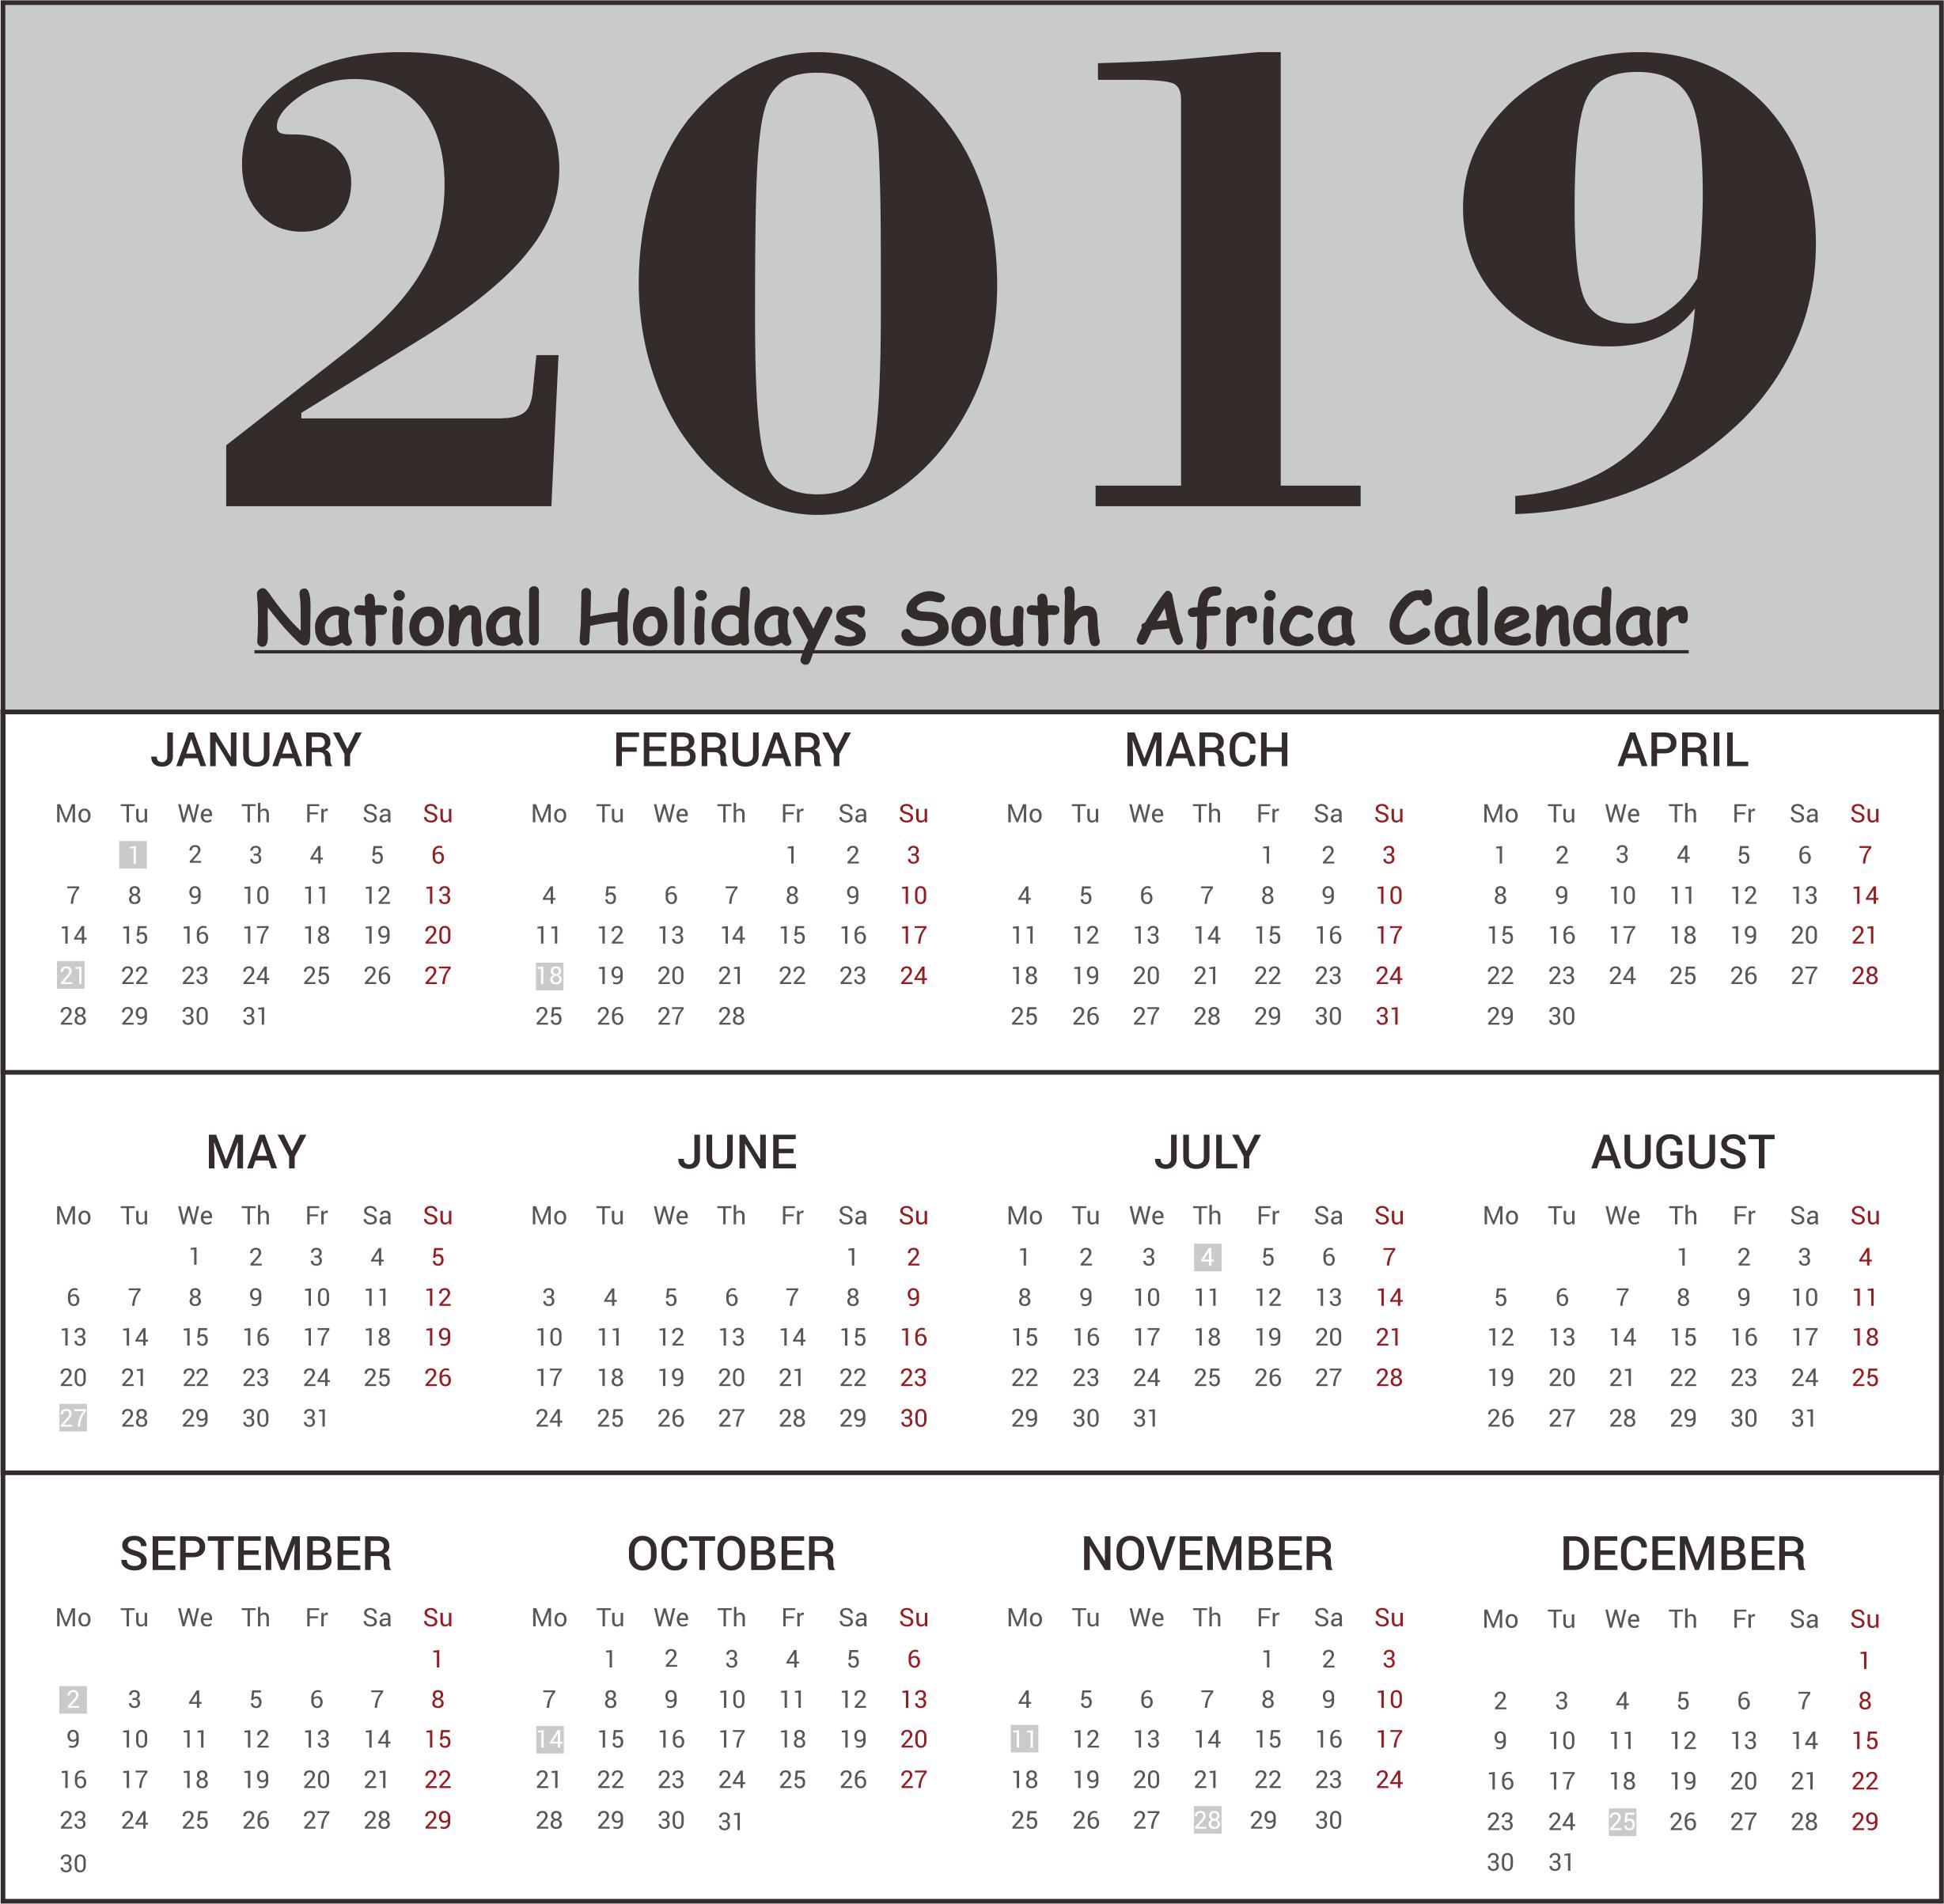 National Holidays 2019 SA (South Africa)